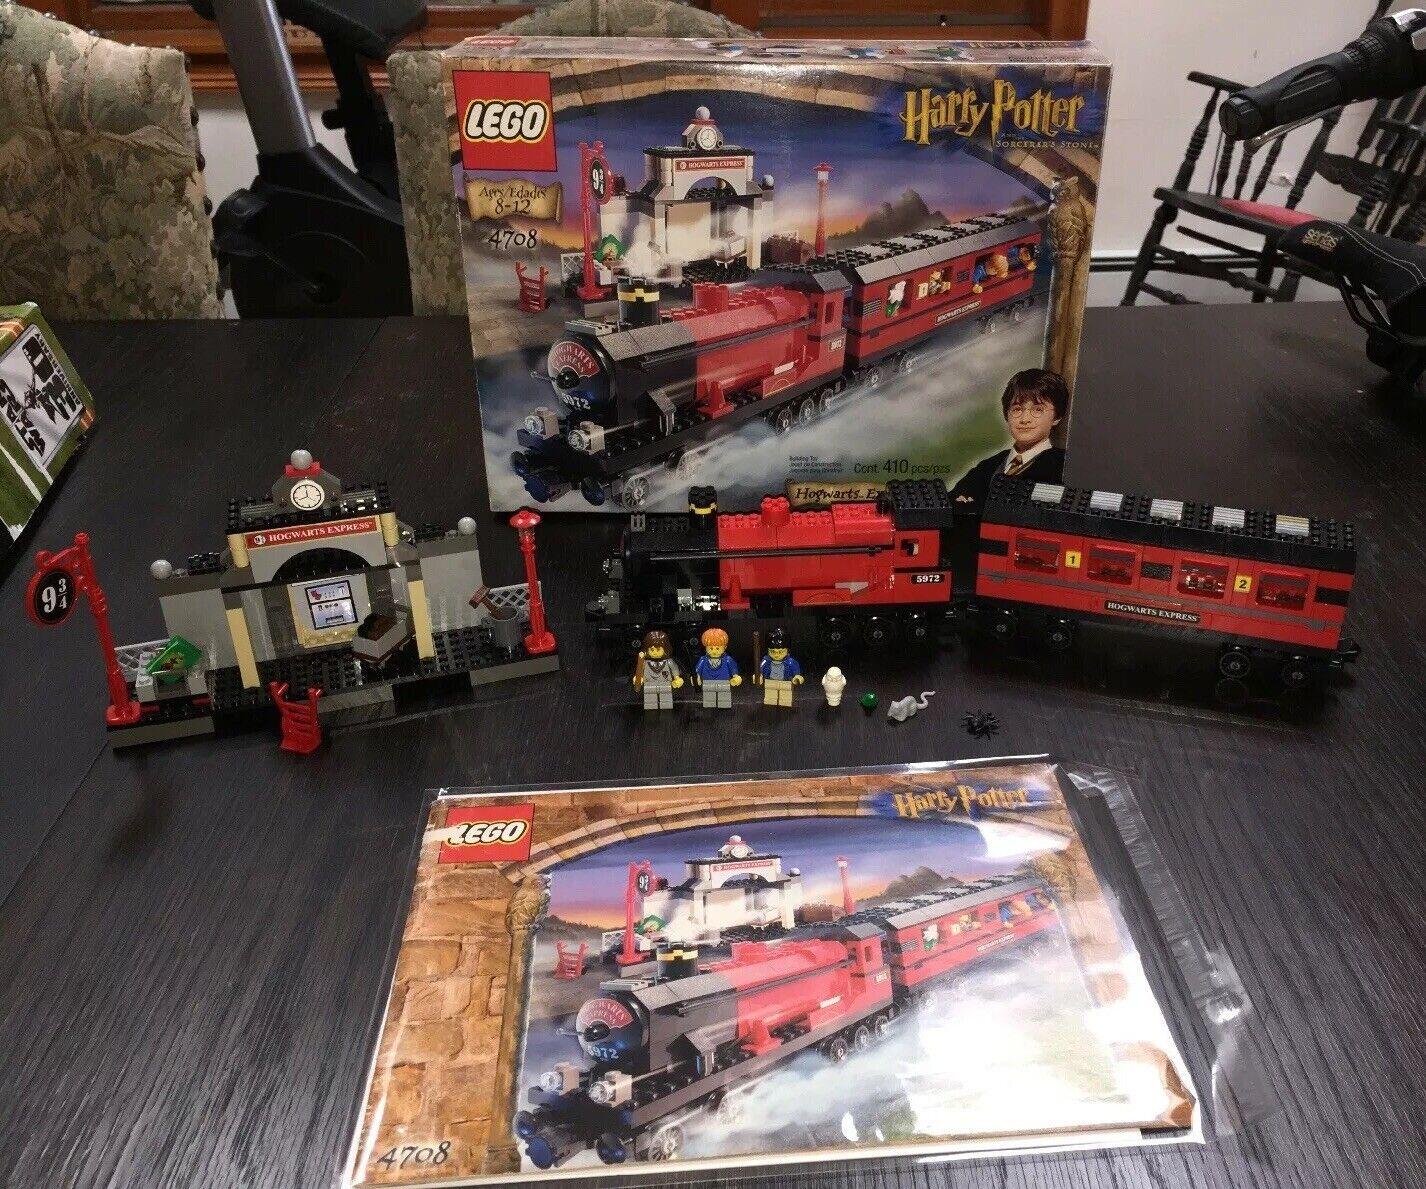 4708 Lego Harry Potter Hogwarts Express Completo Con Caja Y Manual Mini Figuras